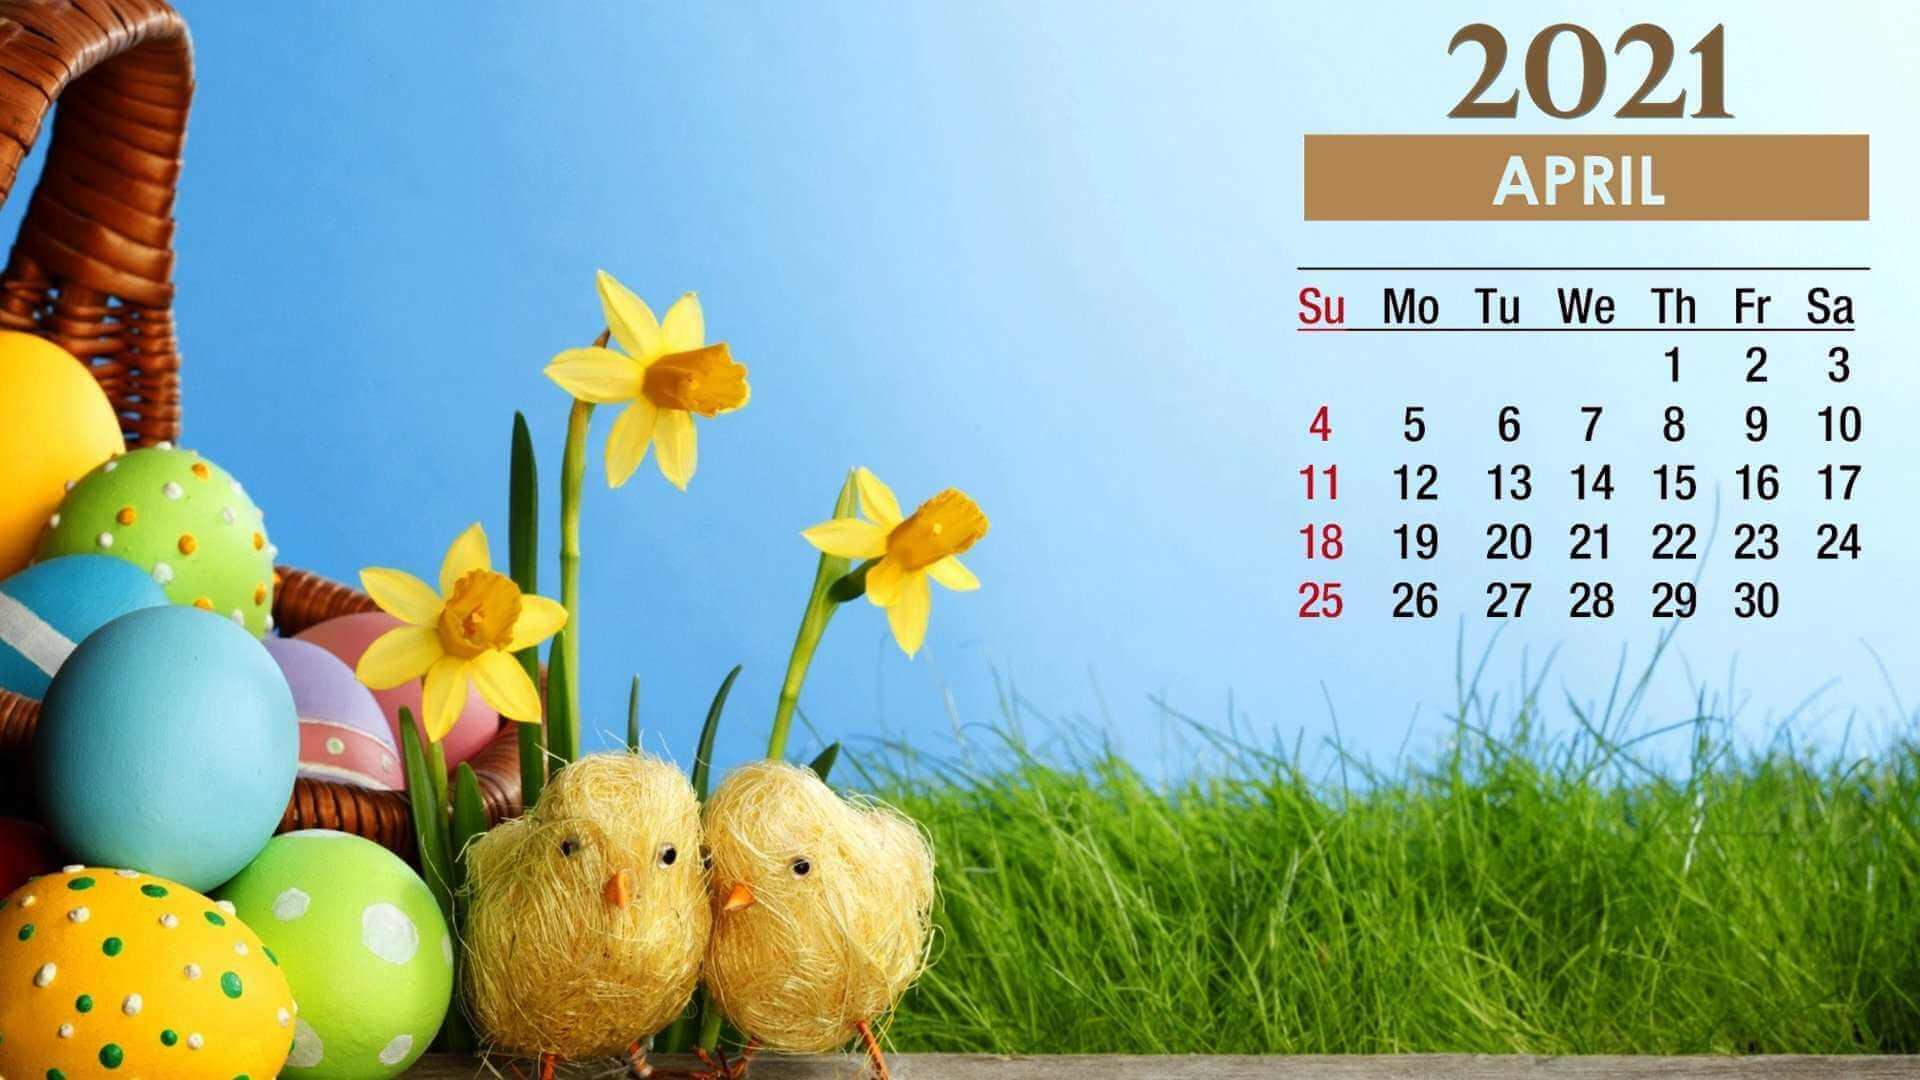 Cute April 2021 Calendar Wallpaper